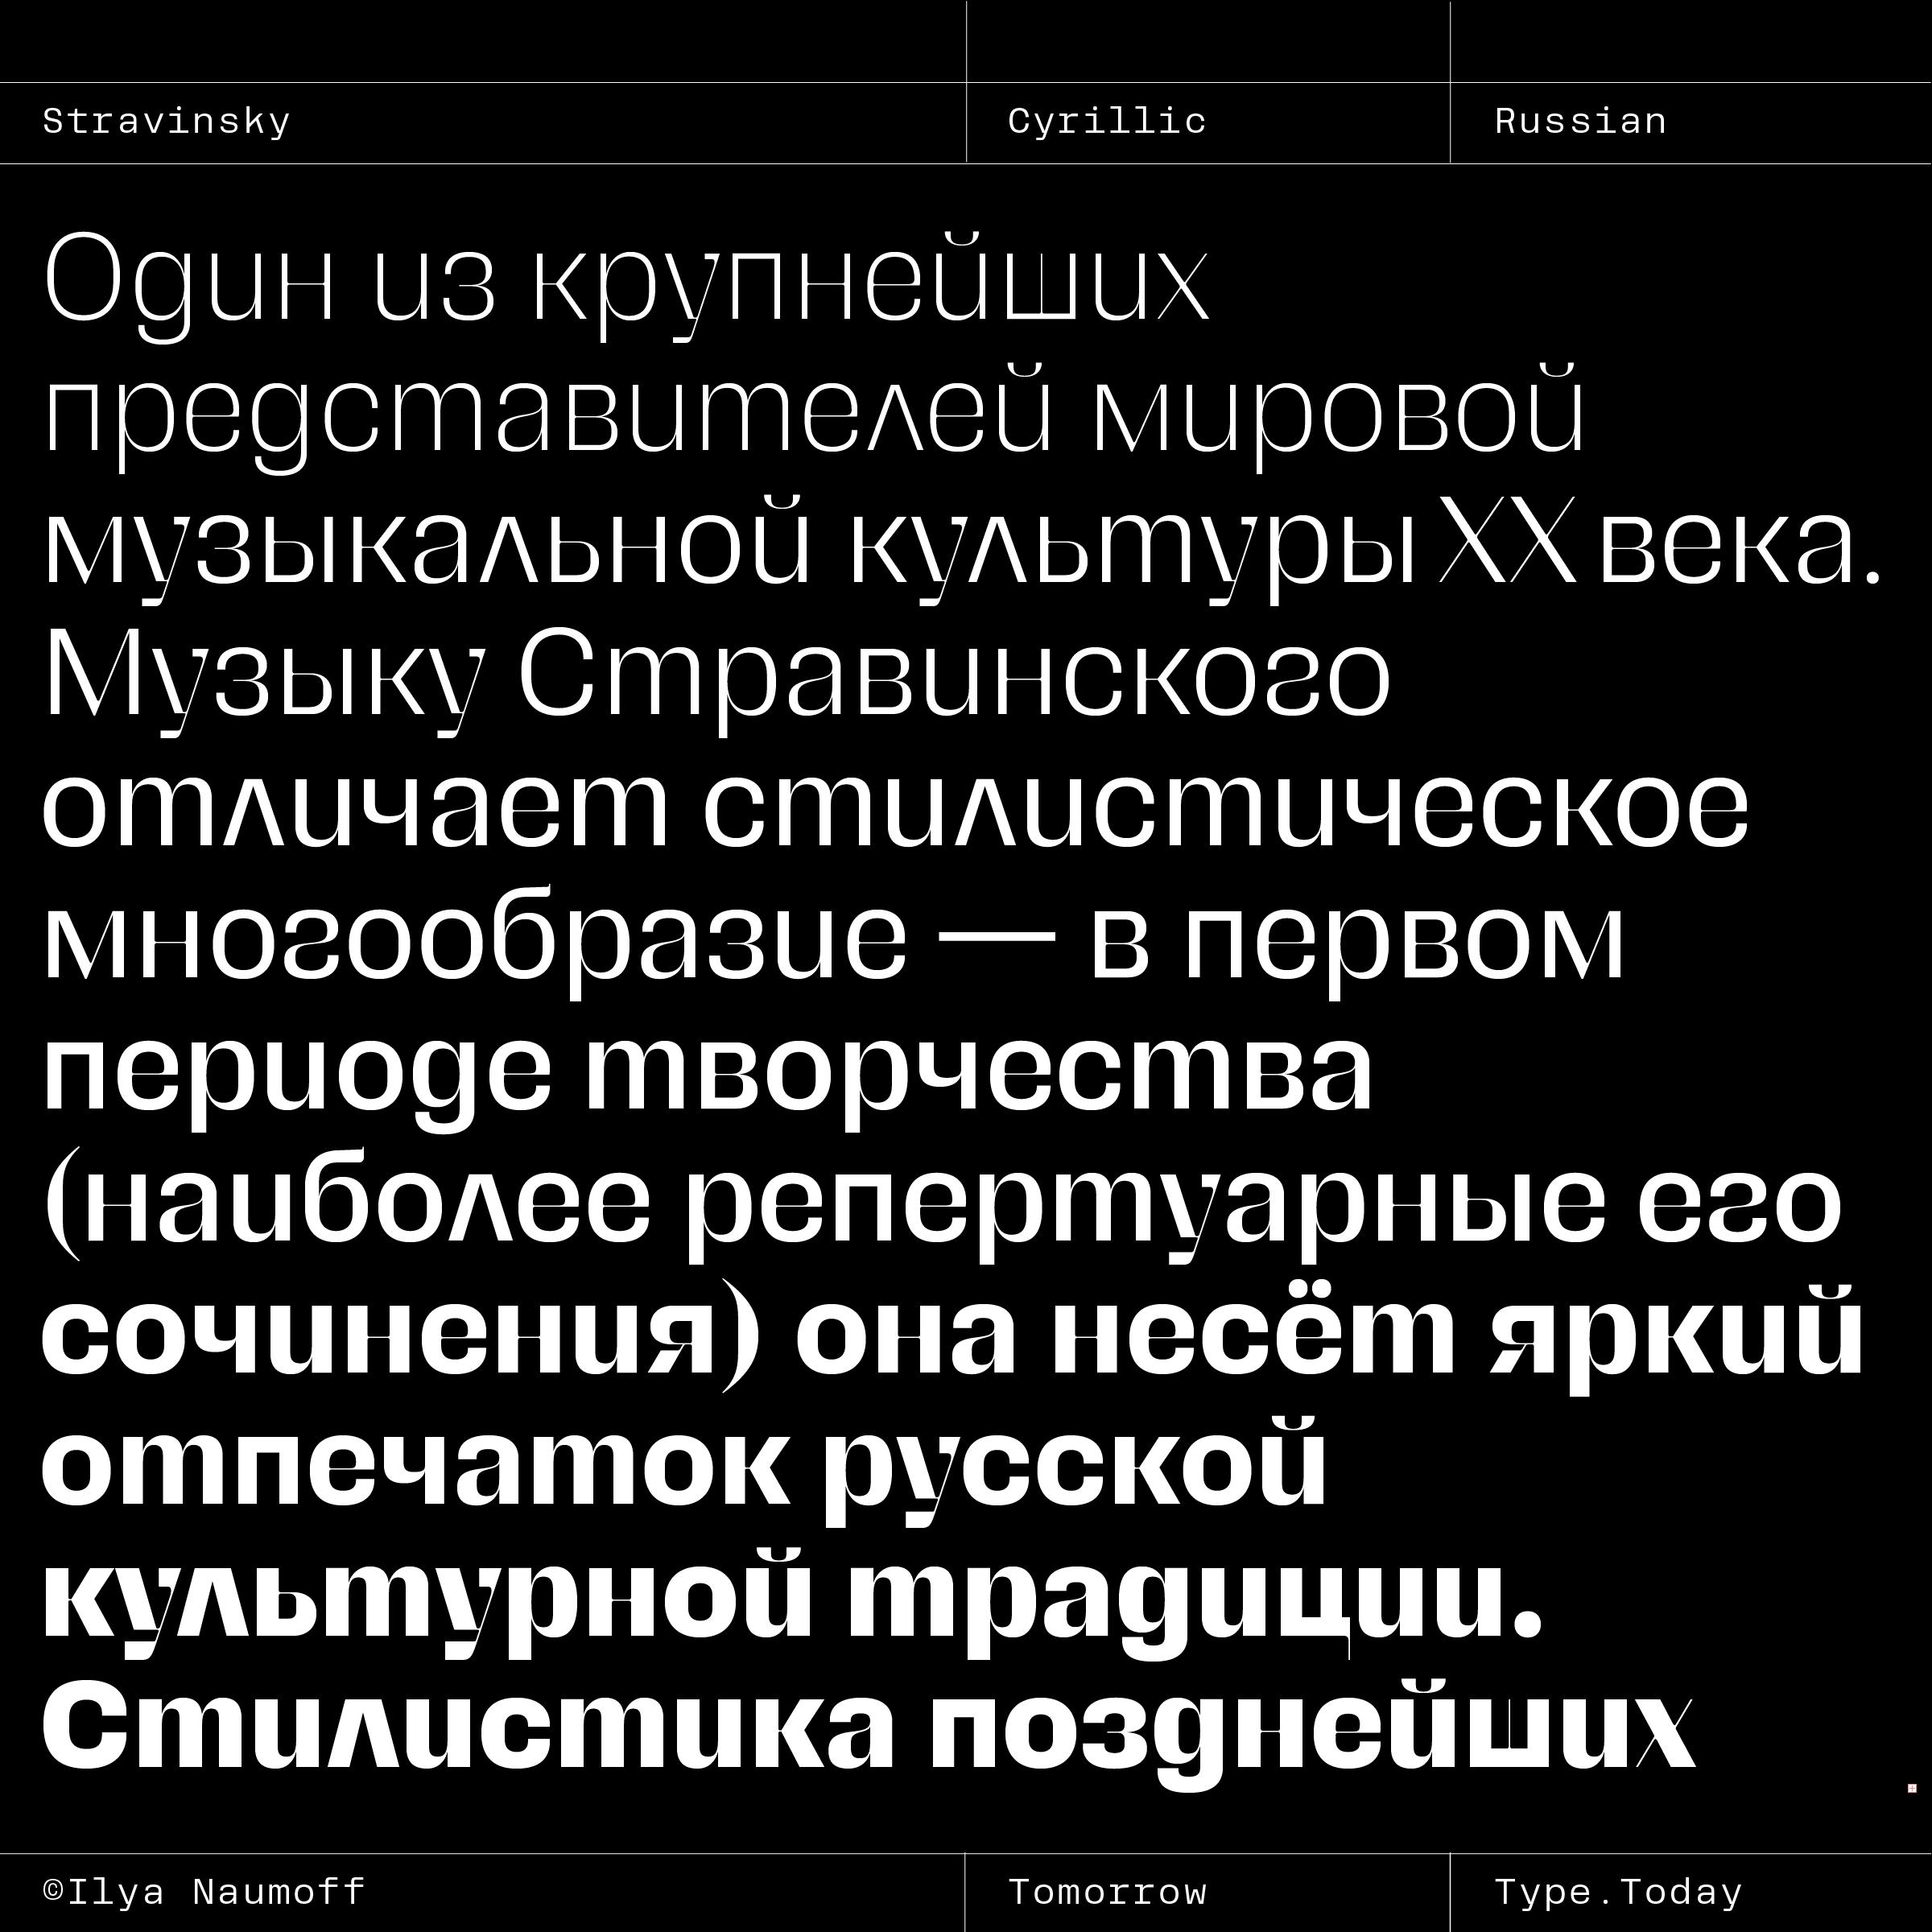 14-Stravinsky